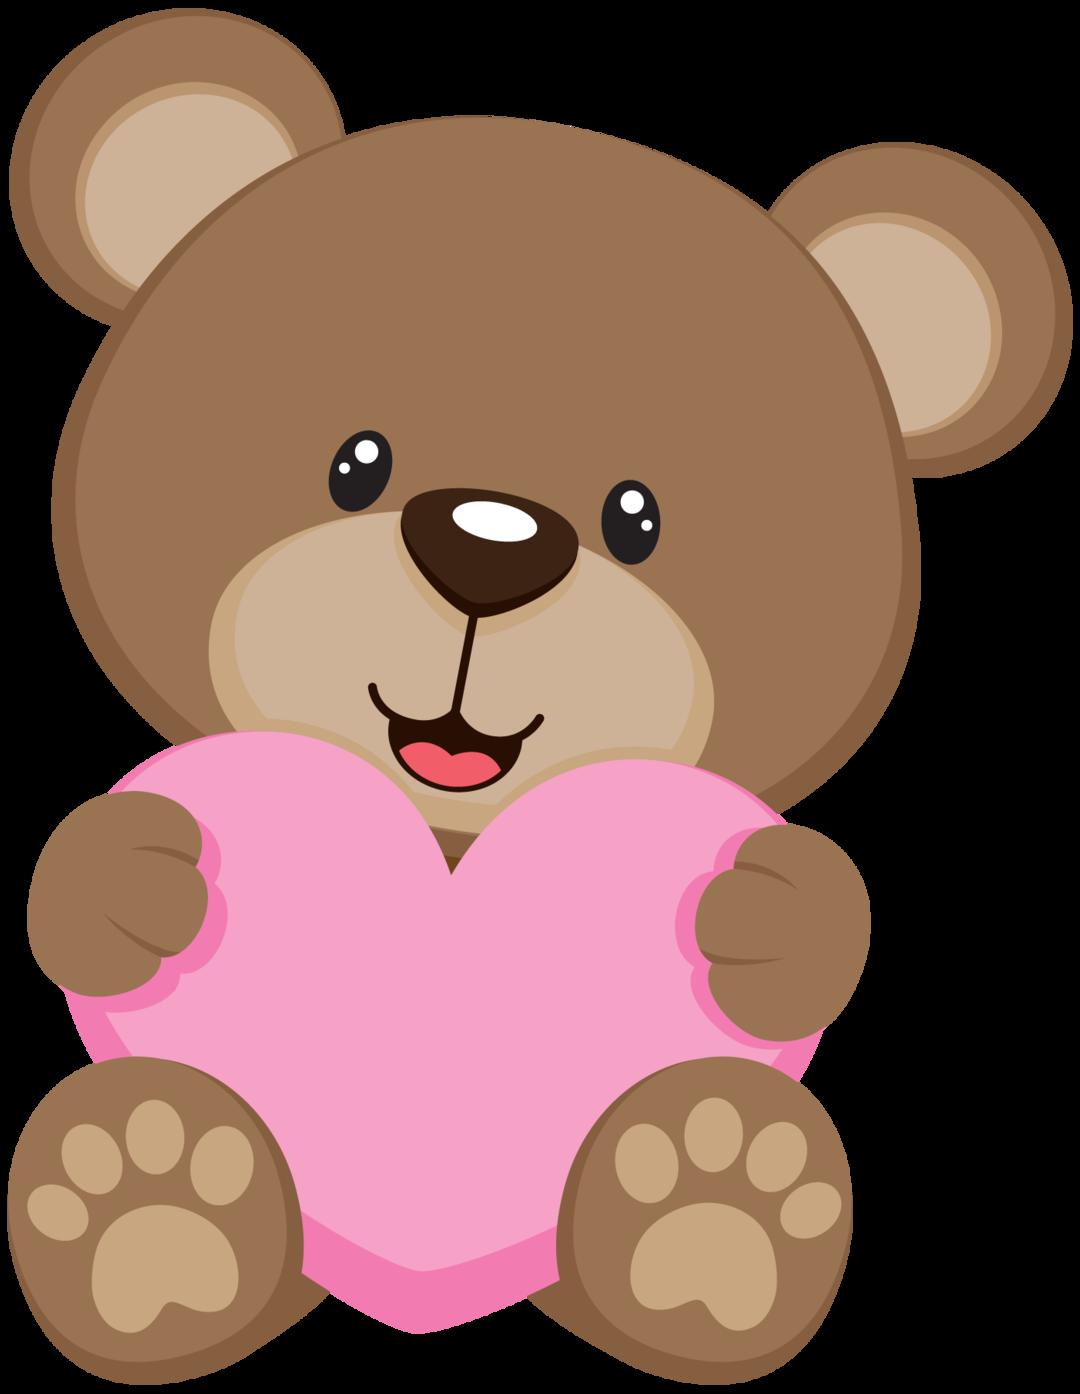 Preschool clipart bear, Preschool bear Transparent FREE for.